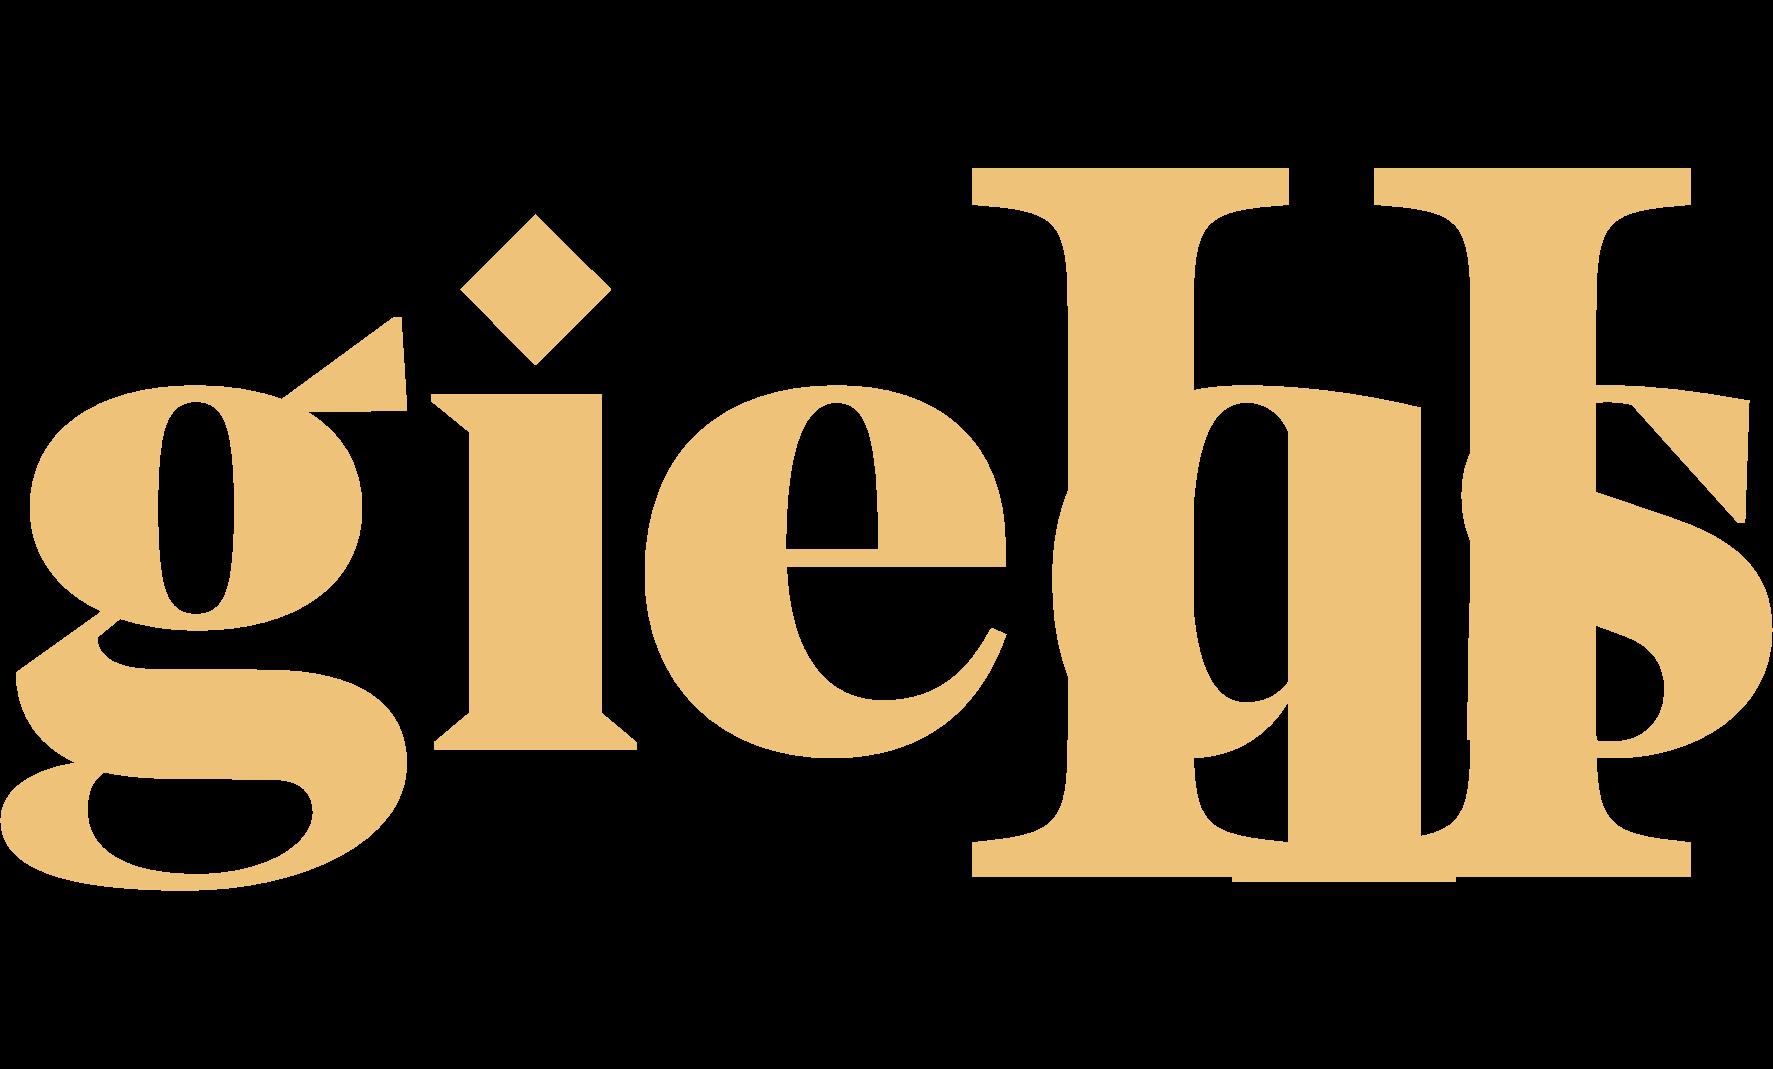 GIEQs II Banner